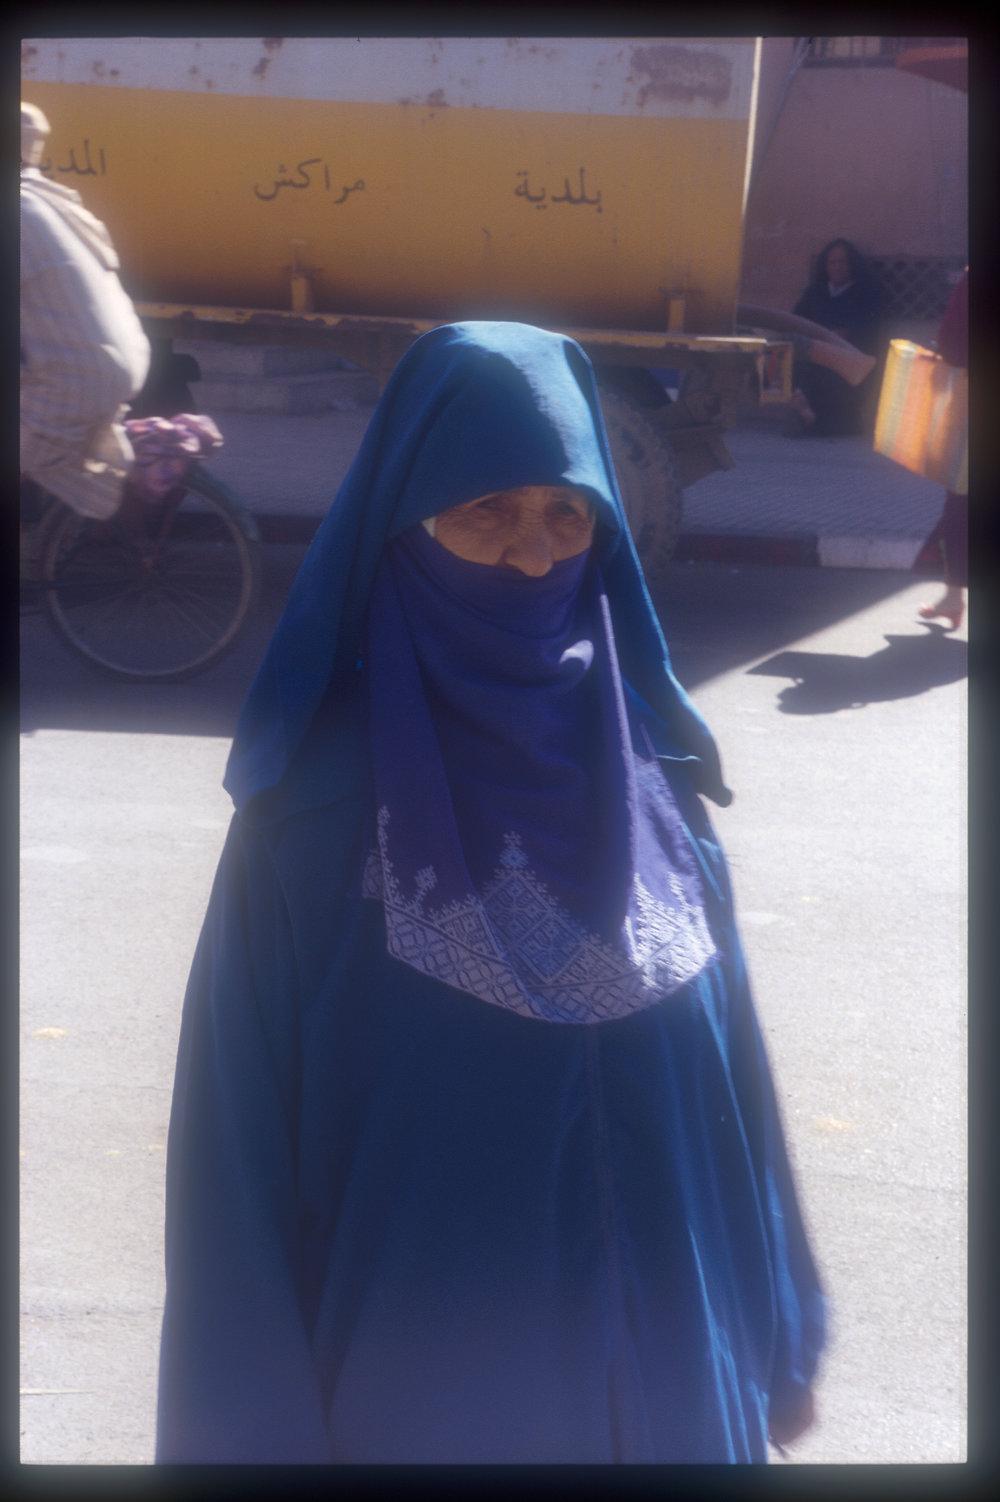 femme voile bleu maroc.JPG